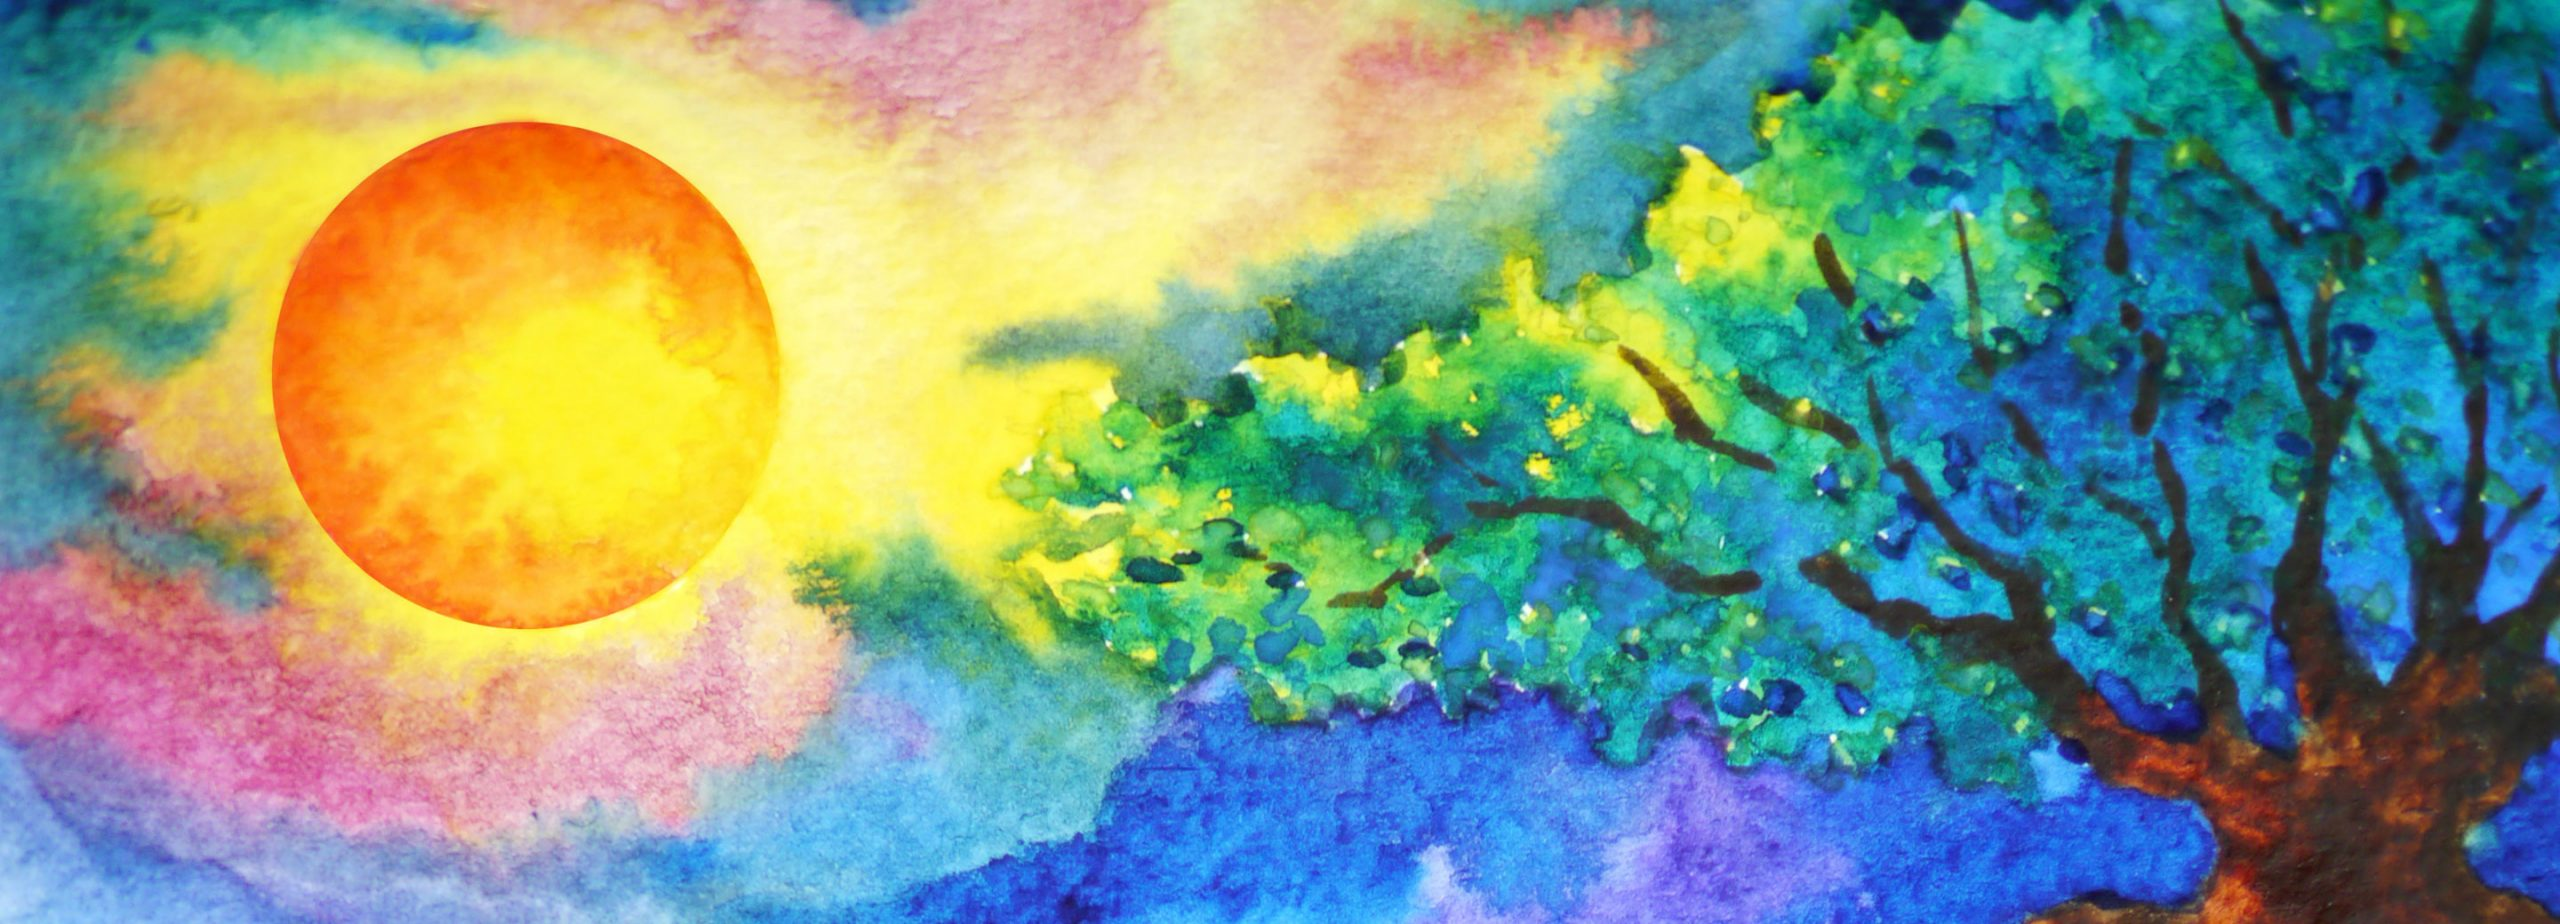 painting-treeandsun